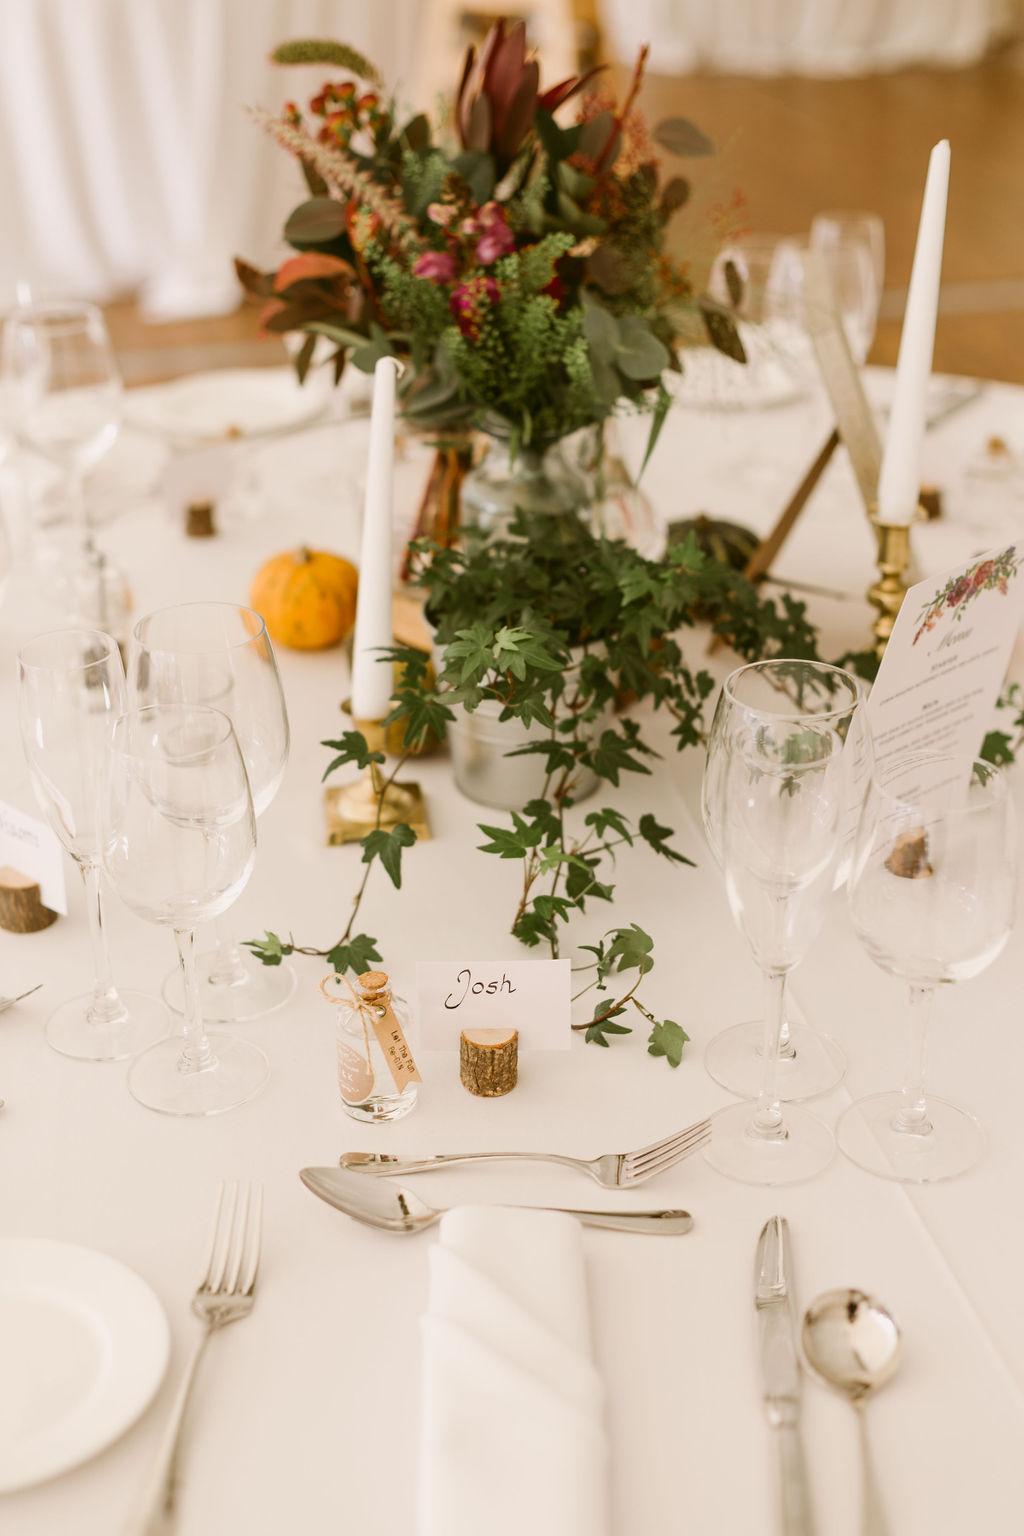 Ivy and pumpkin wedding centre piece inspiration | fall wedding inspo | wooden block centre pieces